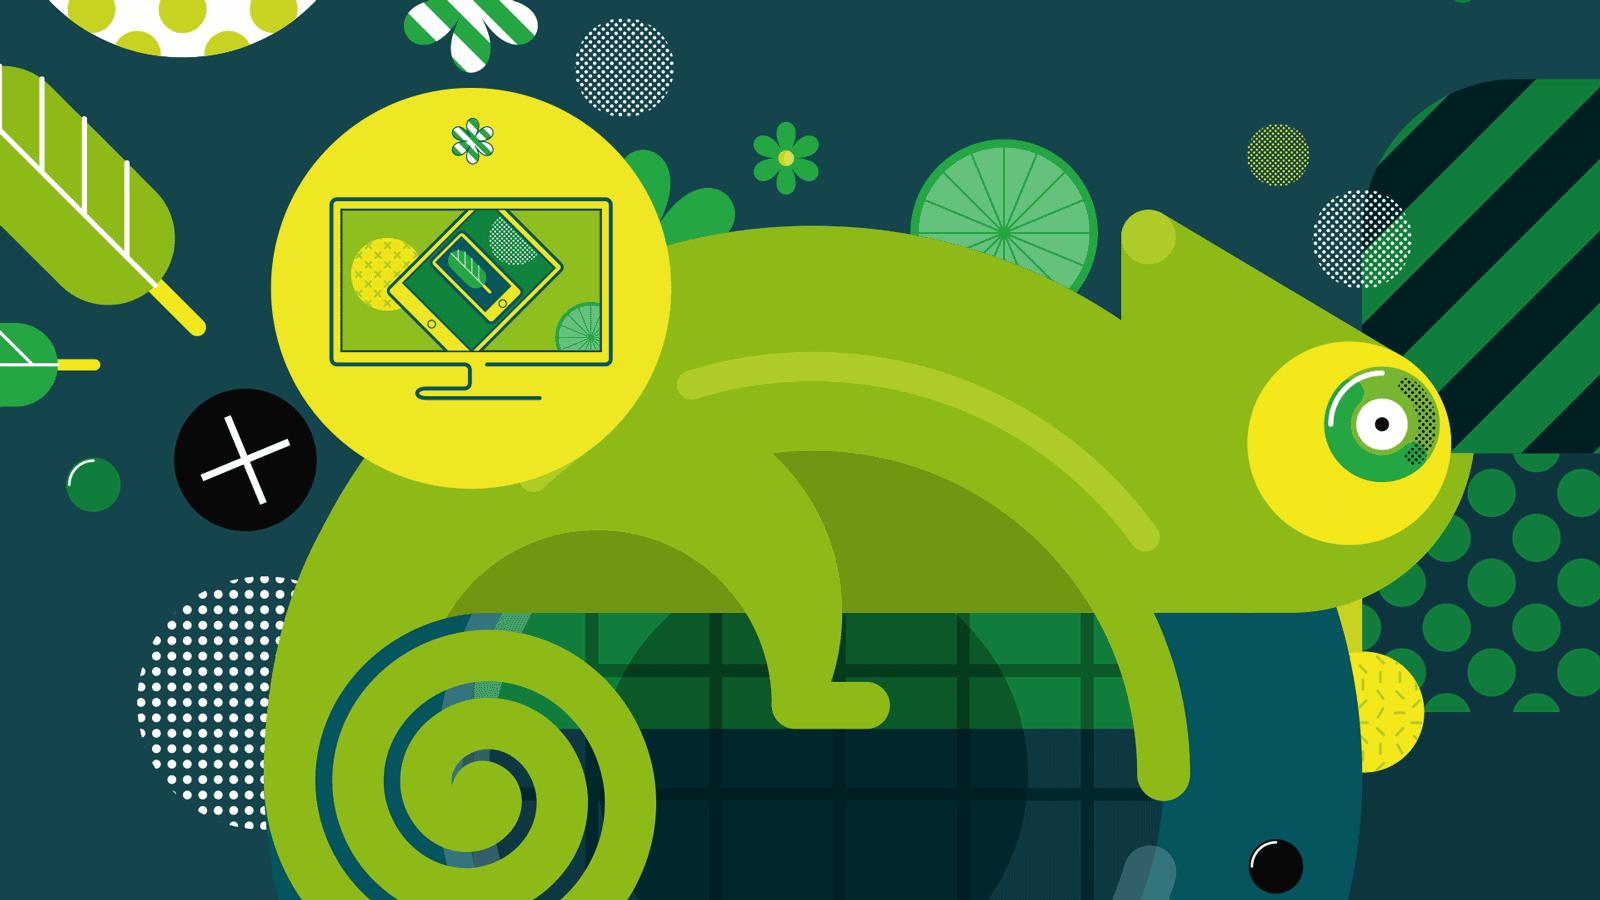 Chameleon lead graphic